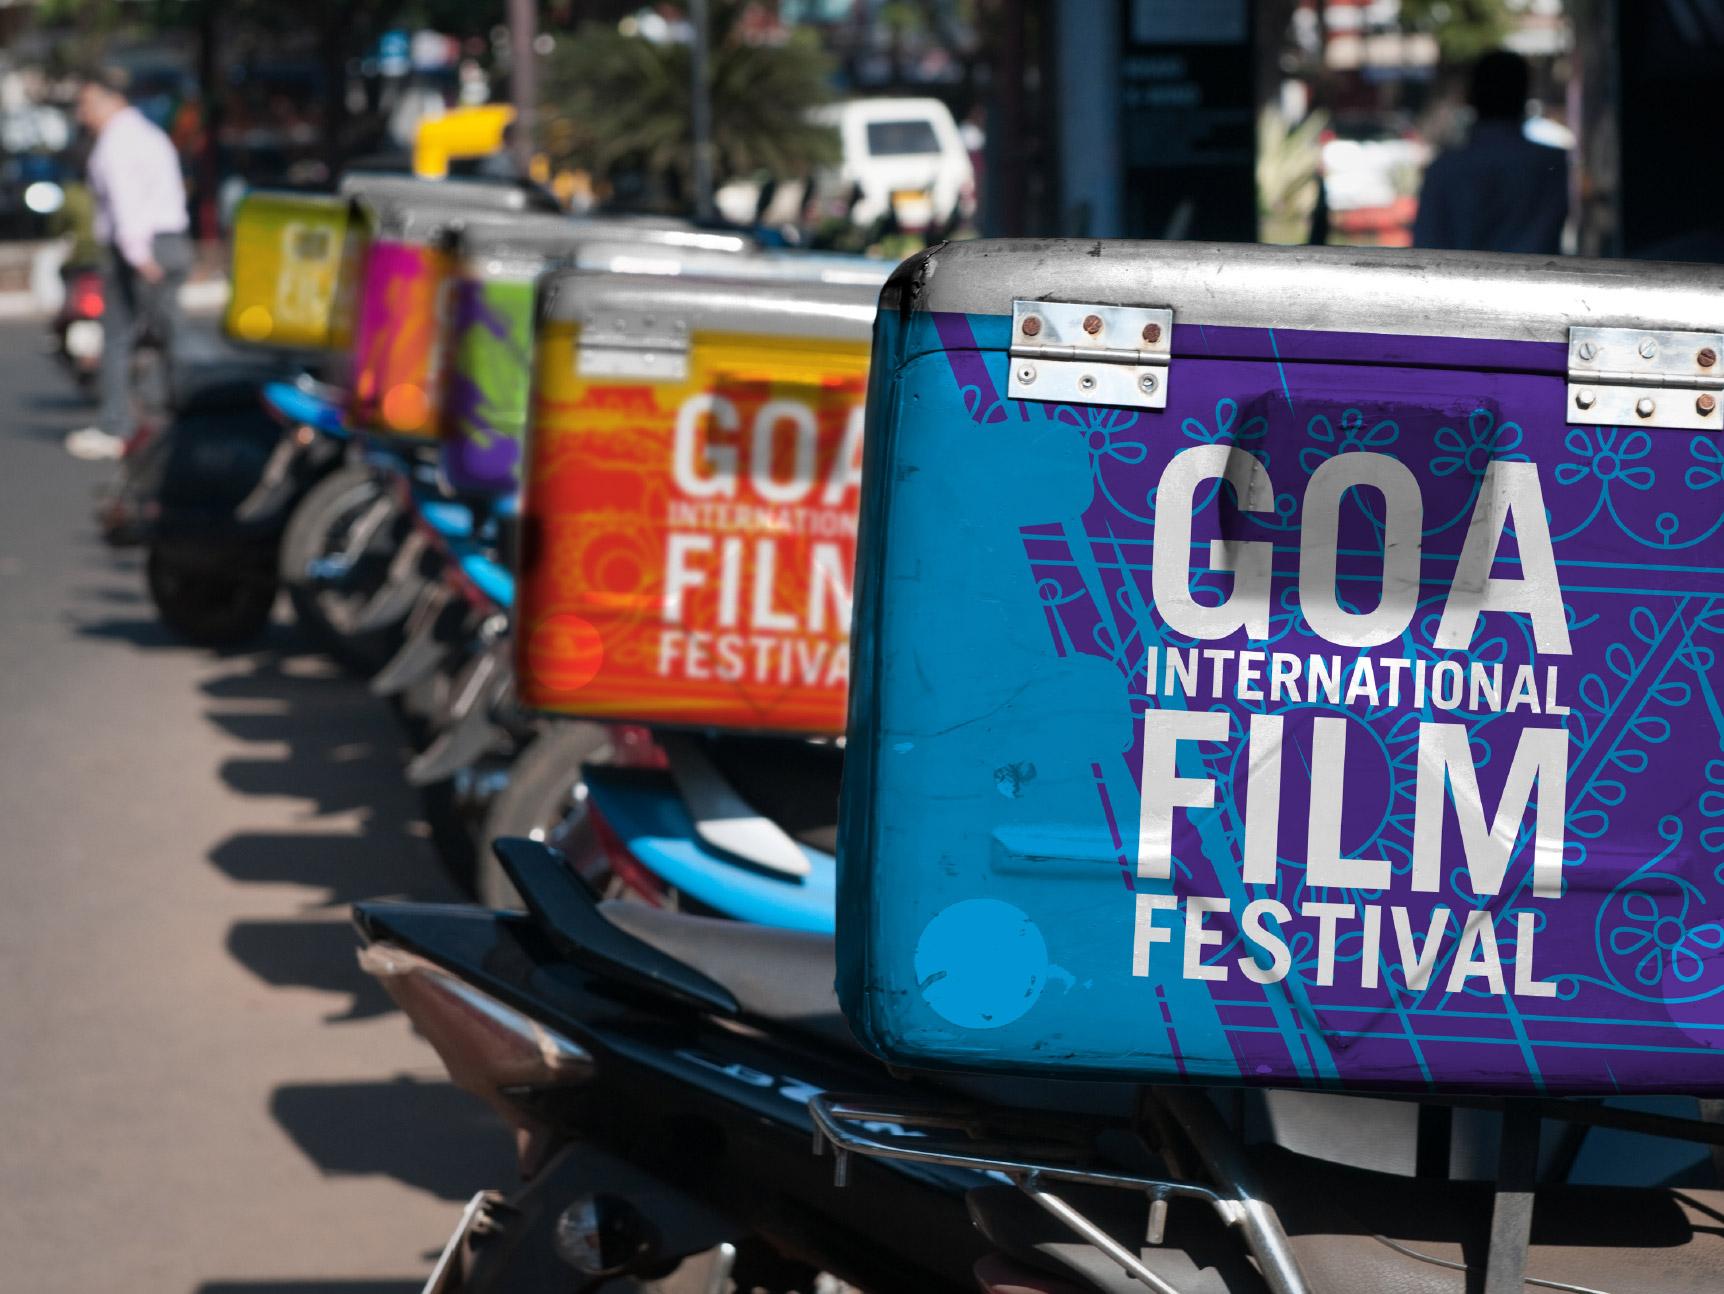 GOA-international-film-festival-sputnik-design-partners-toronto-7.jpg